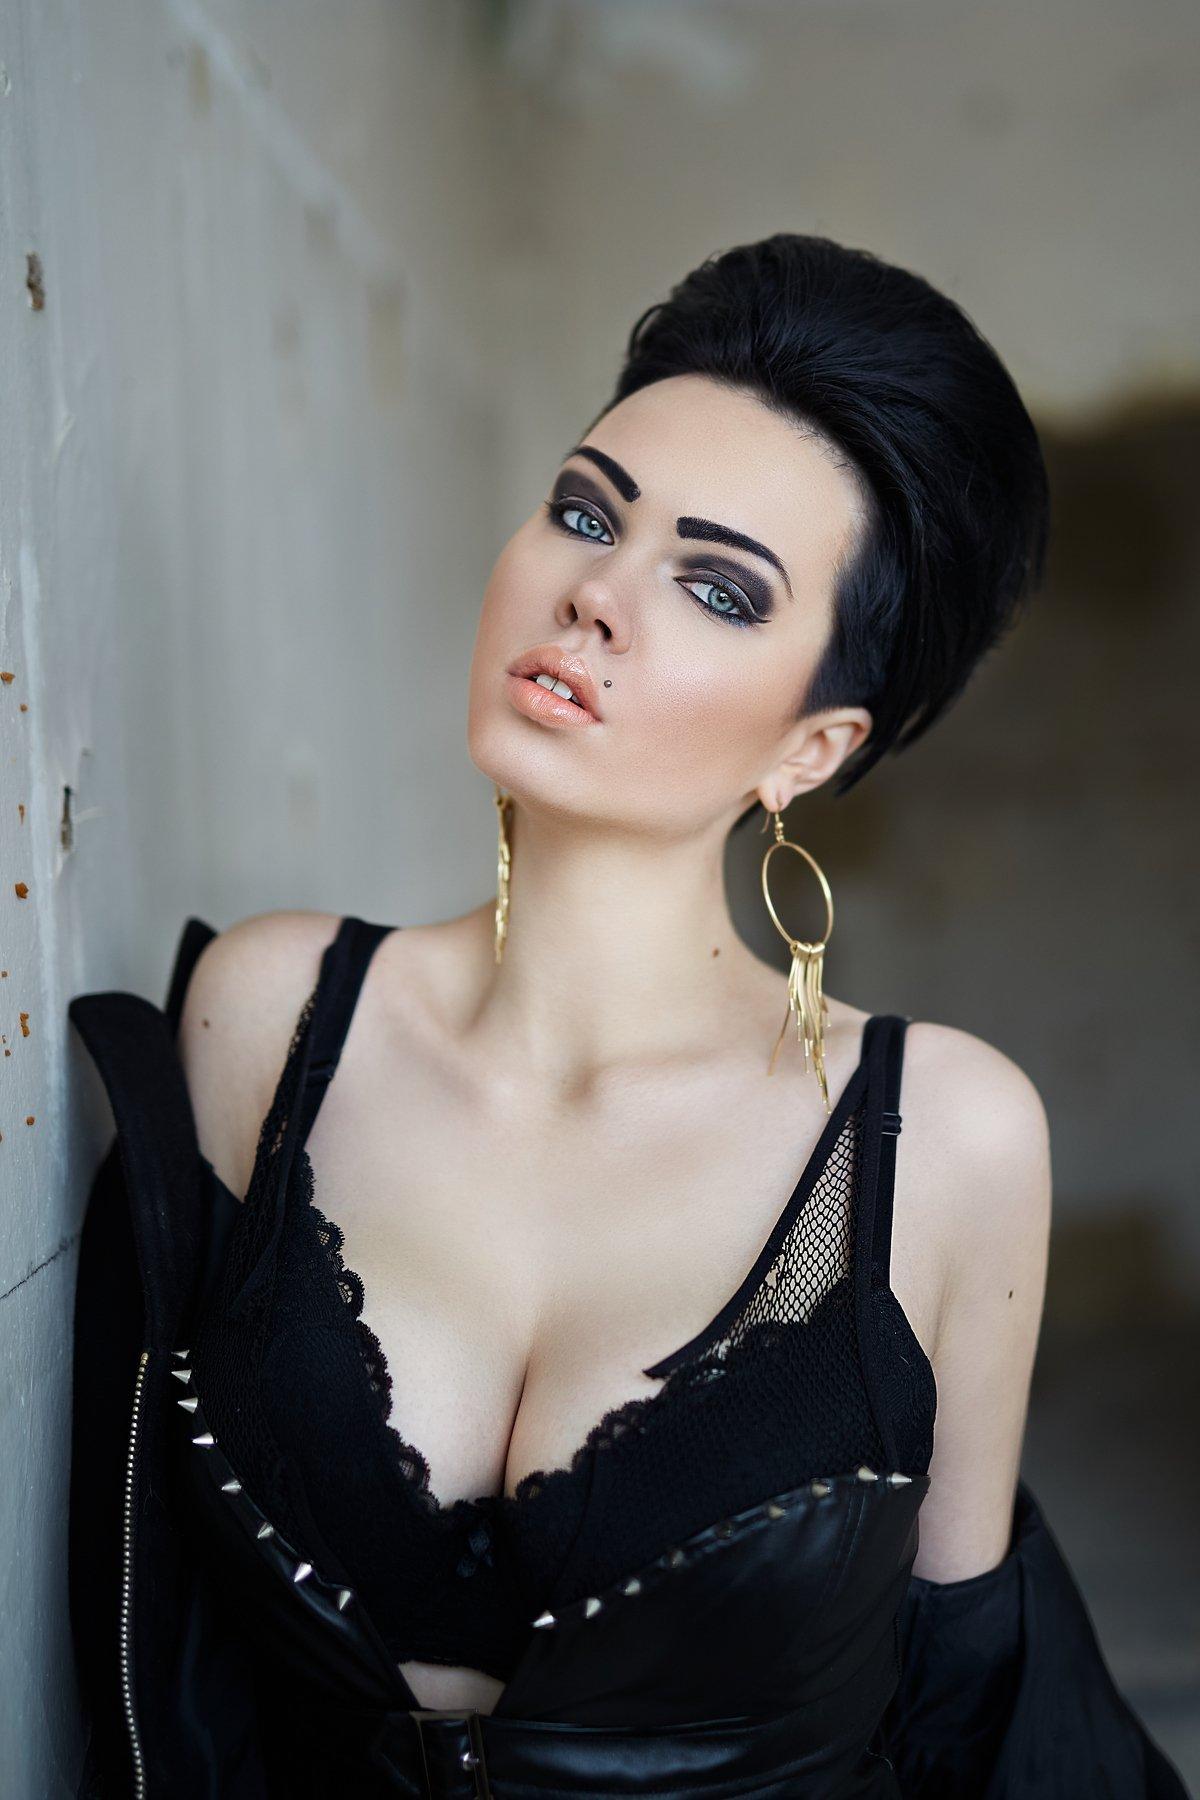 girl, sexy, портрет, девушка, красота, Веселов Александр